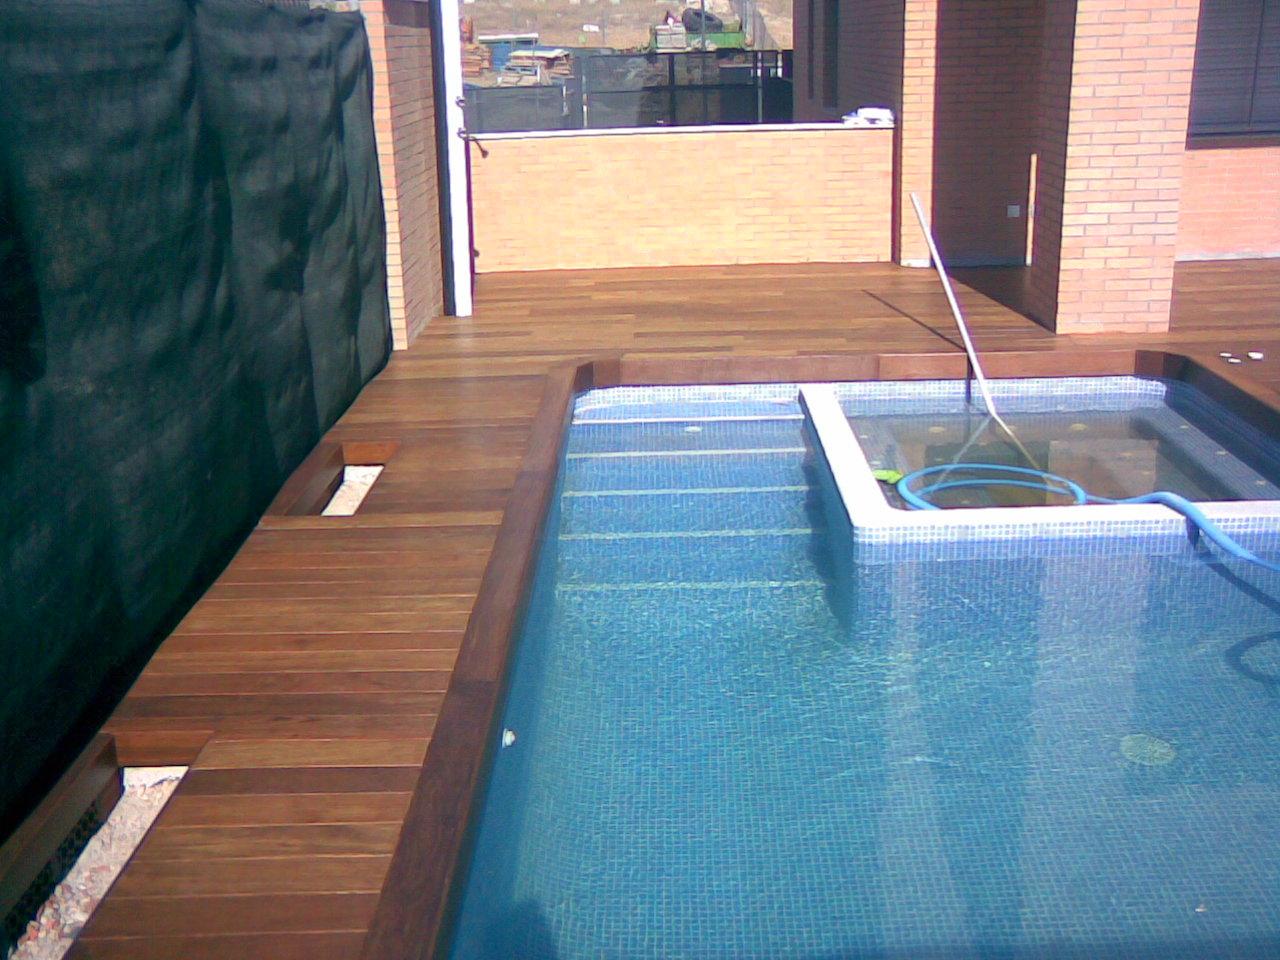 Madera maciza de exterior ipe en piscina for Ipe madera exterior